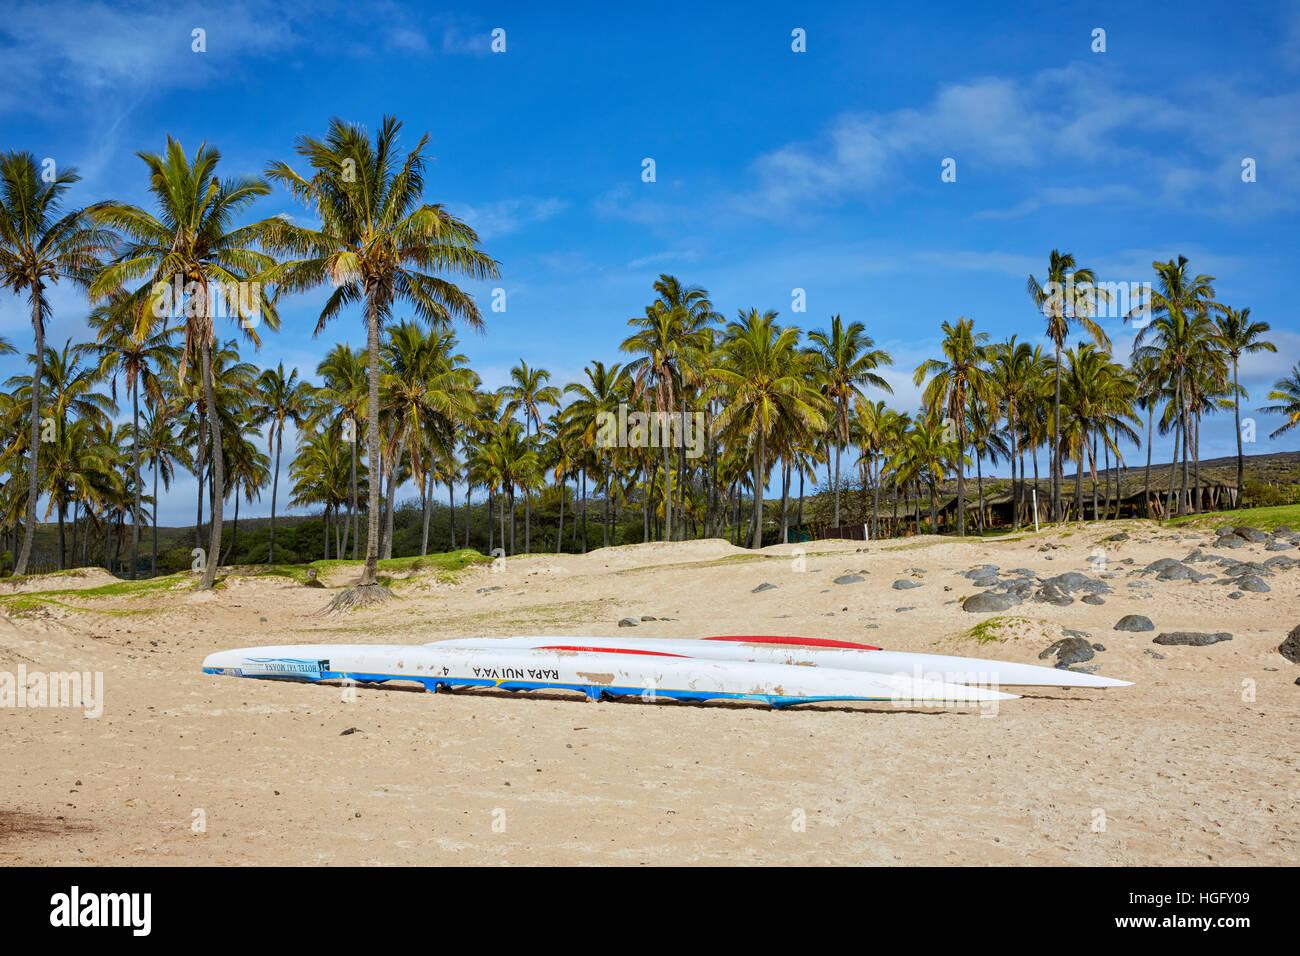 La playa de Anakena, Isla de Pascua, Chile Imagen De Stock